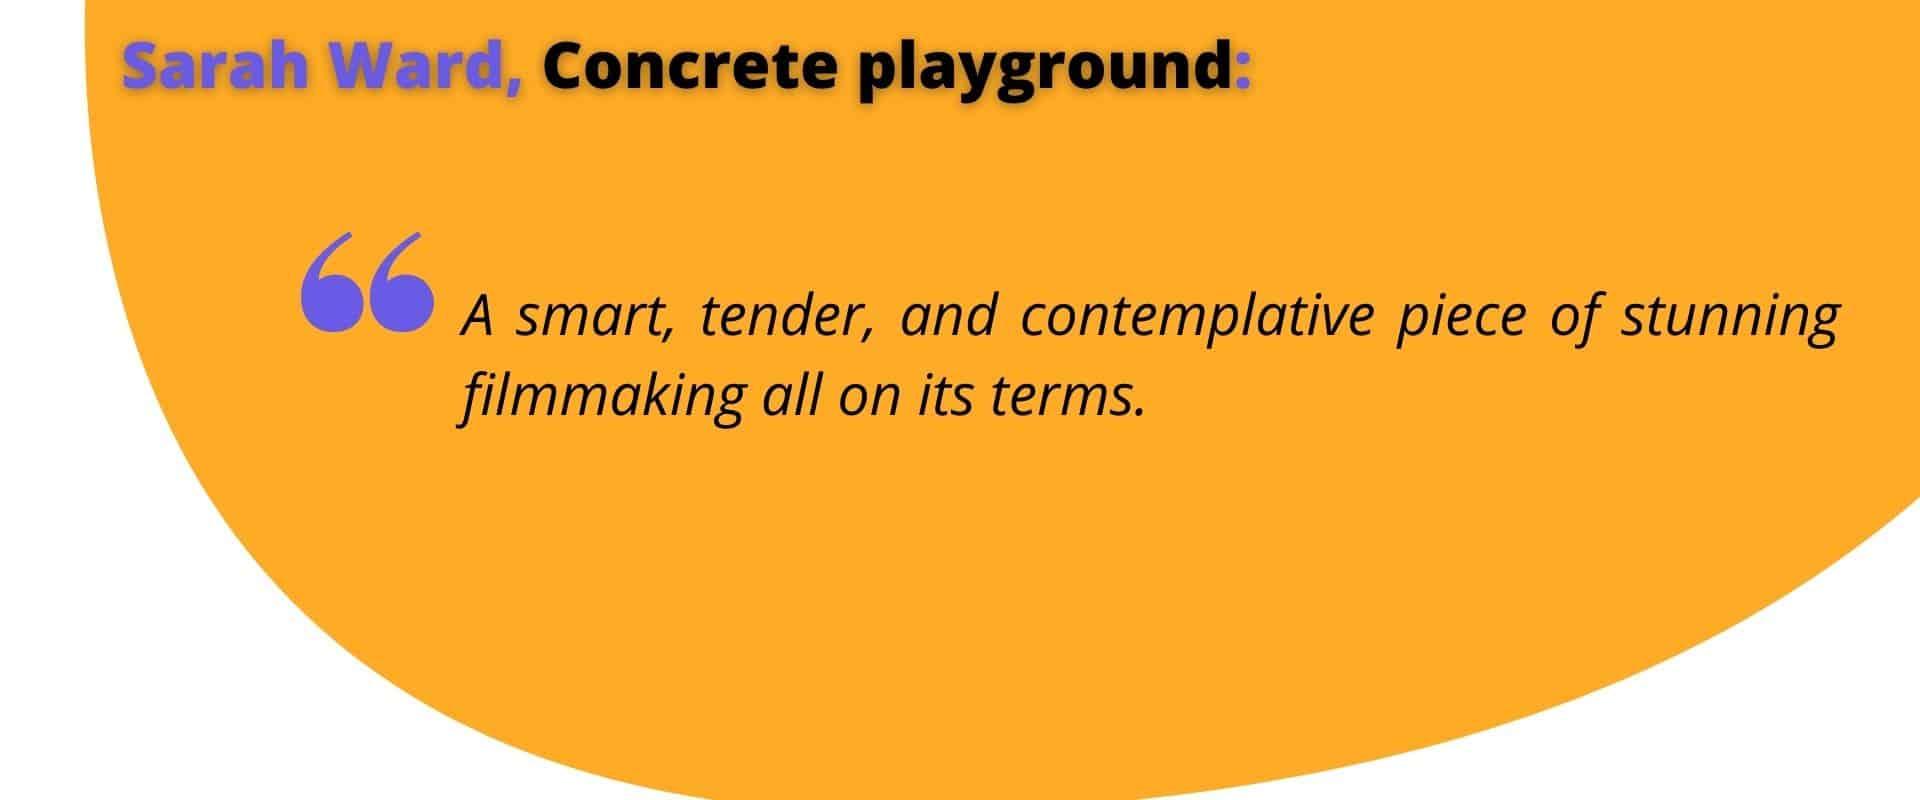 Words by Sarah Ward, Concrete playground